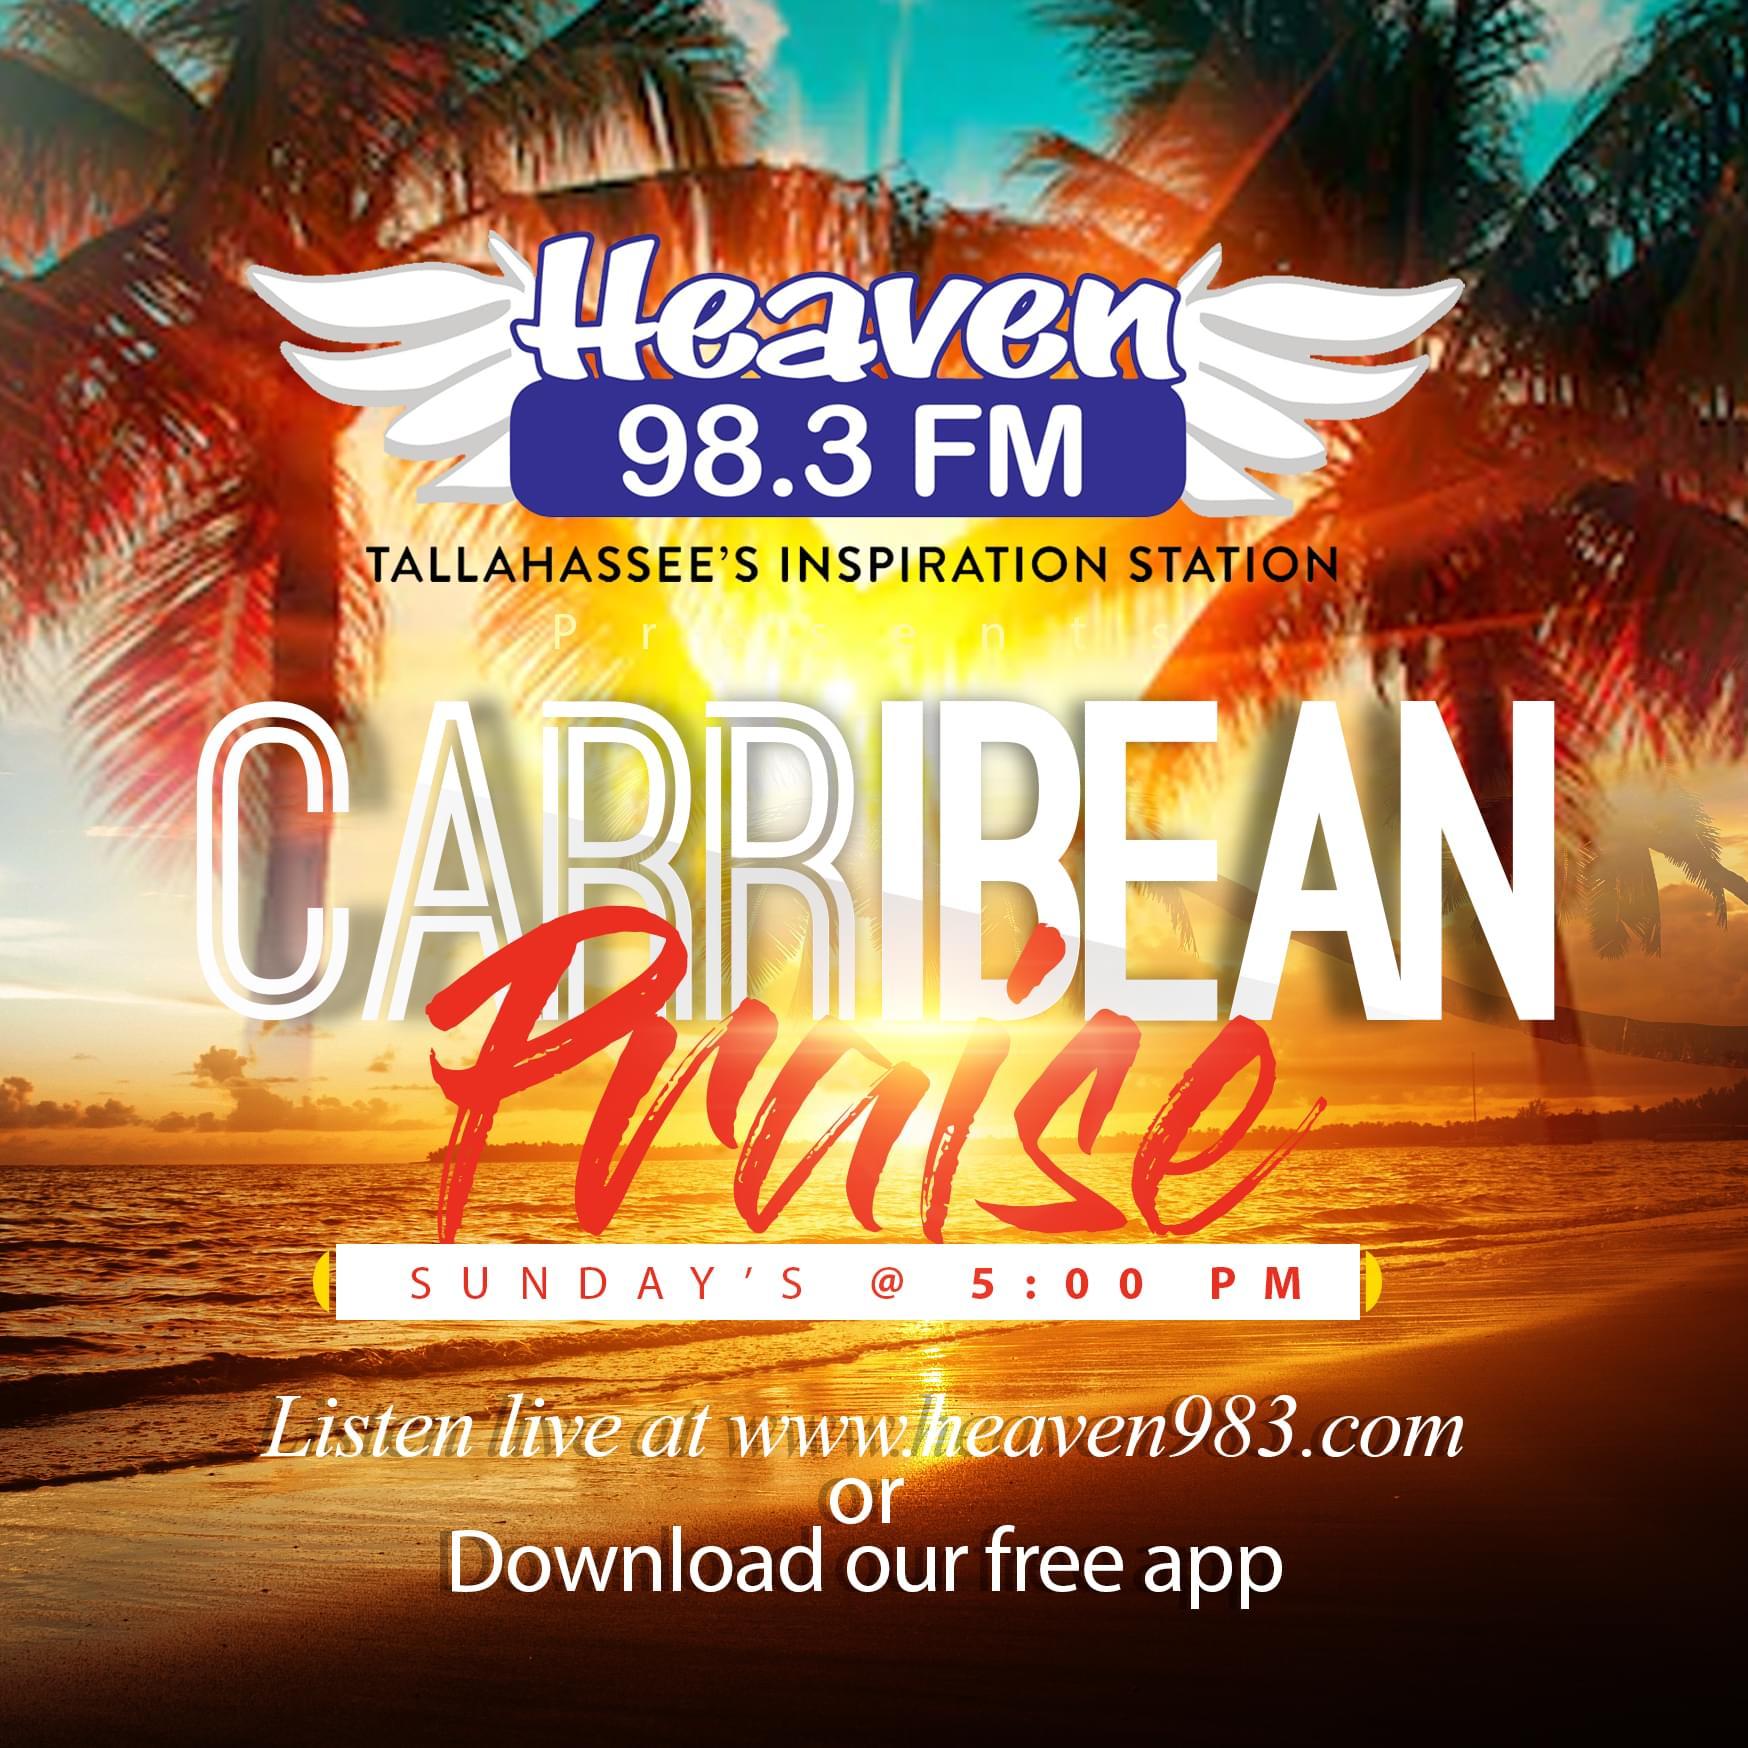 Caribbean Praise